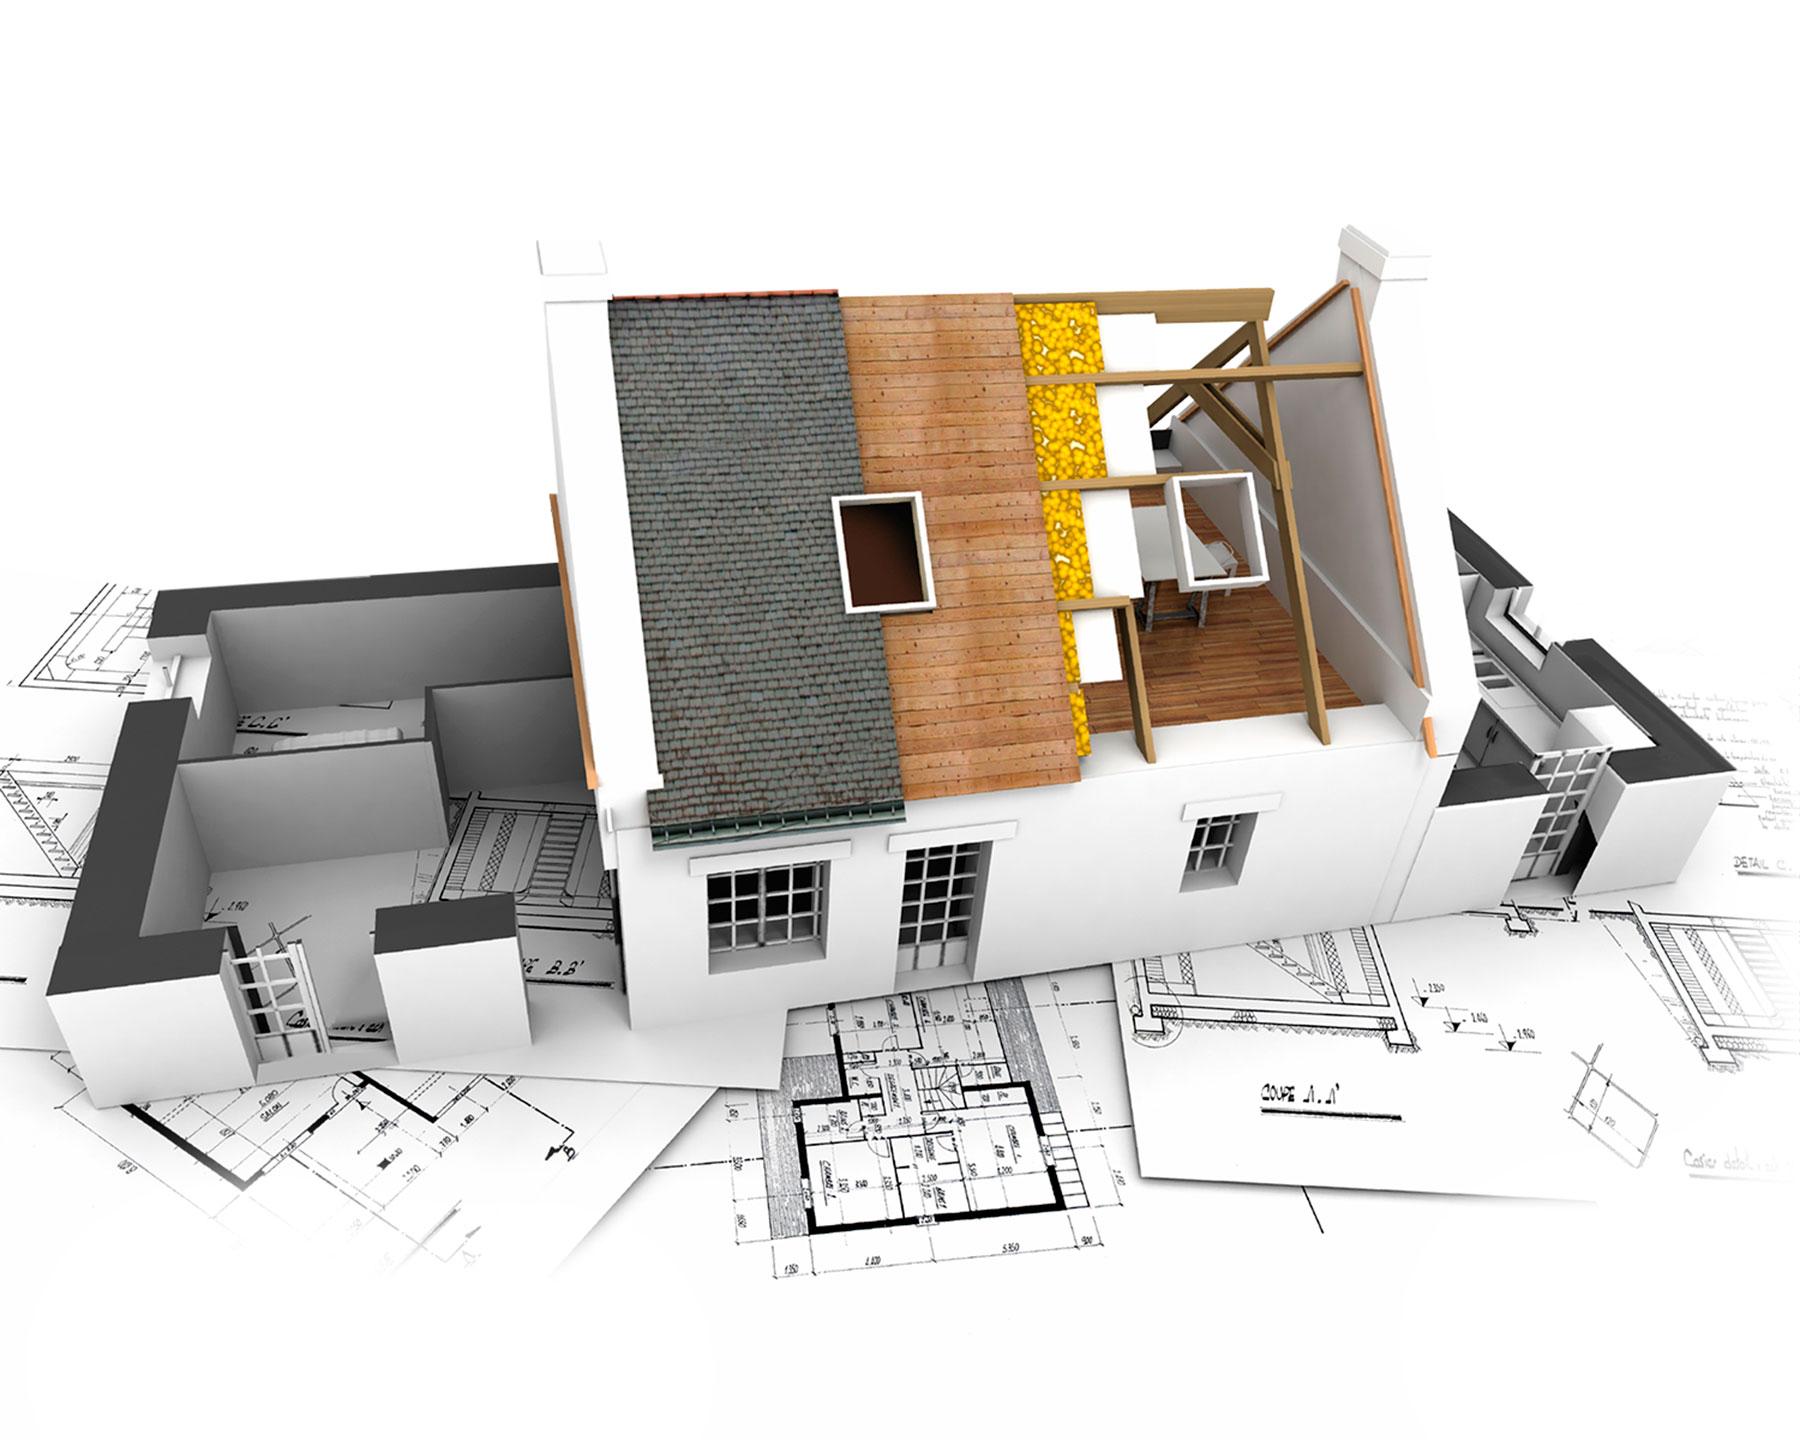 logiciel cmi interface comptabilit et dao cao. Black Bedroom Furniture Sets. Home Design Ideas